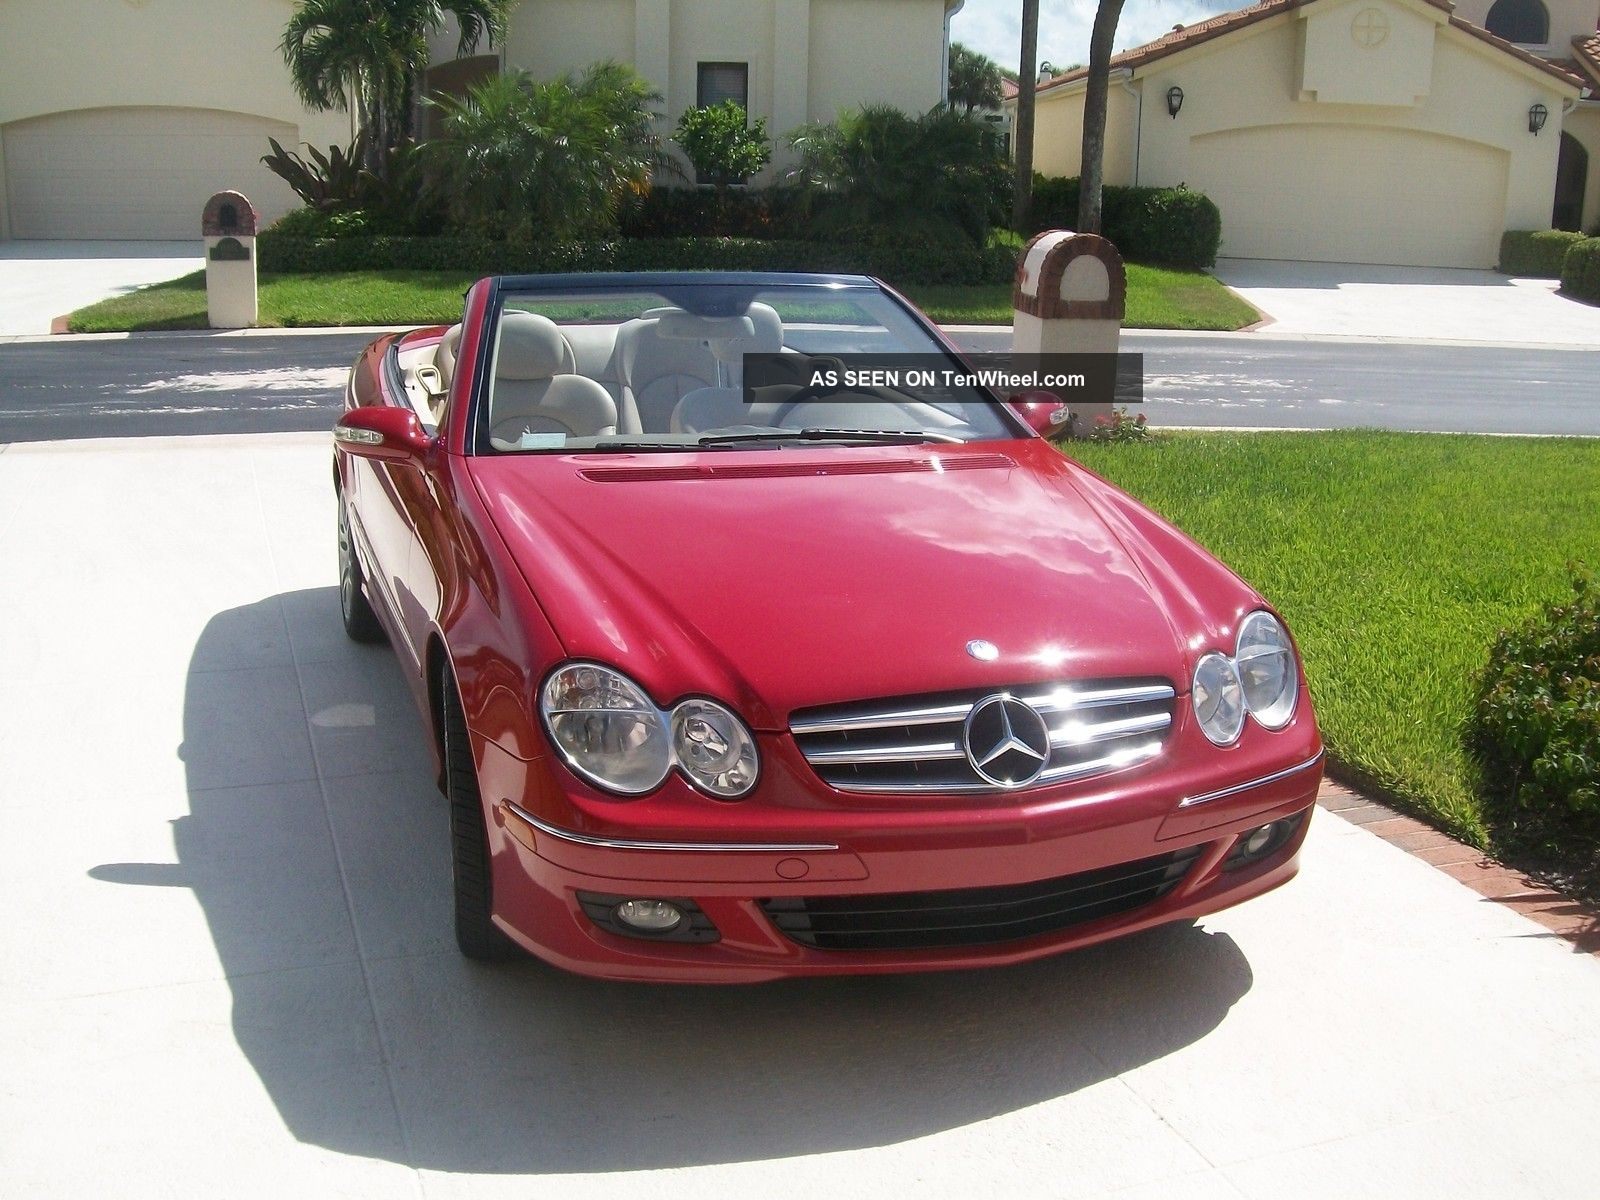 2008 mercedes benz clk 350 convertibl e mars red for 2008 mercedes benz clk350